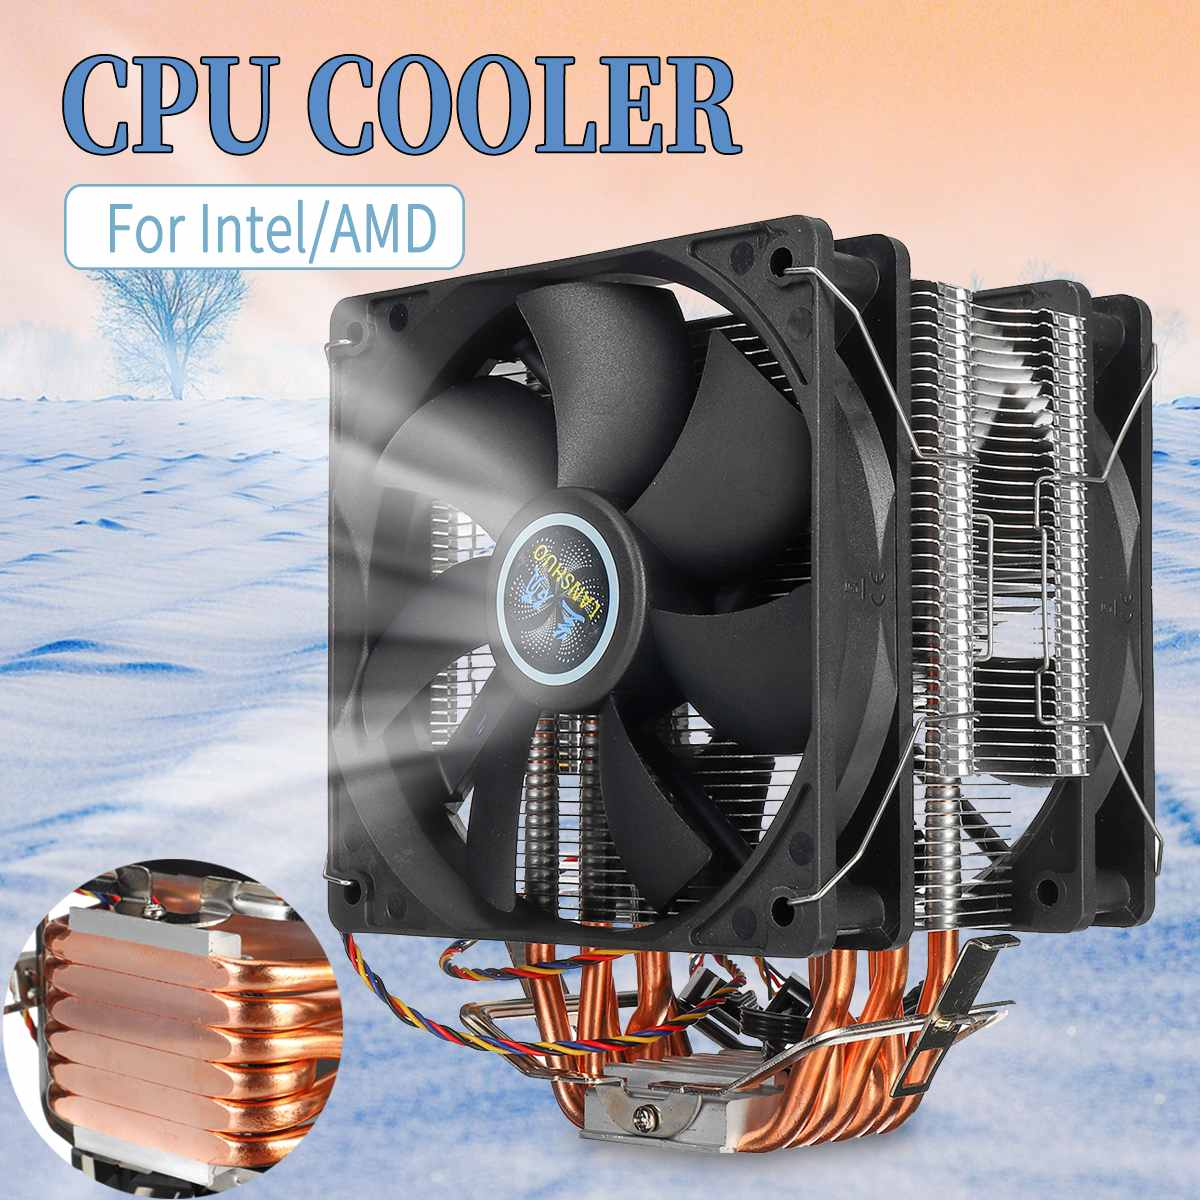 6 caloducs ventilateur refroidisseur de processeur refroidisseur de refroidissement double ventilateur refroidisseur de processeur radiateur pour LGA 1150/1151/1155/1156/1366/775 AMD